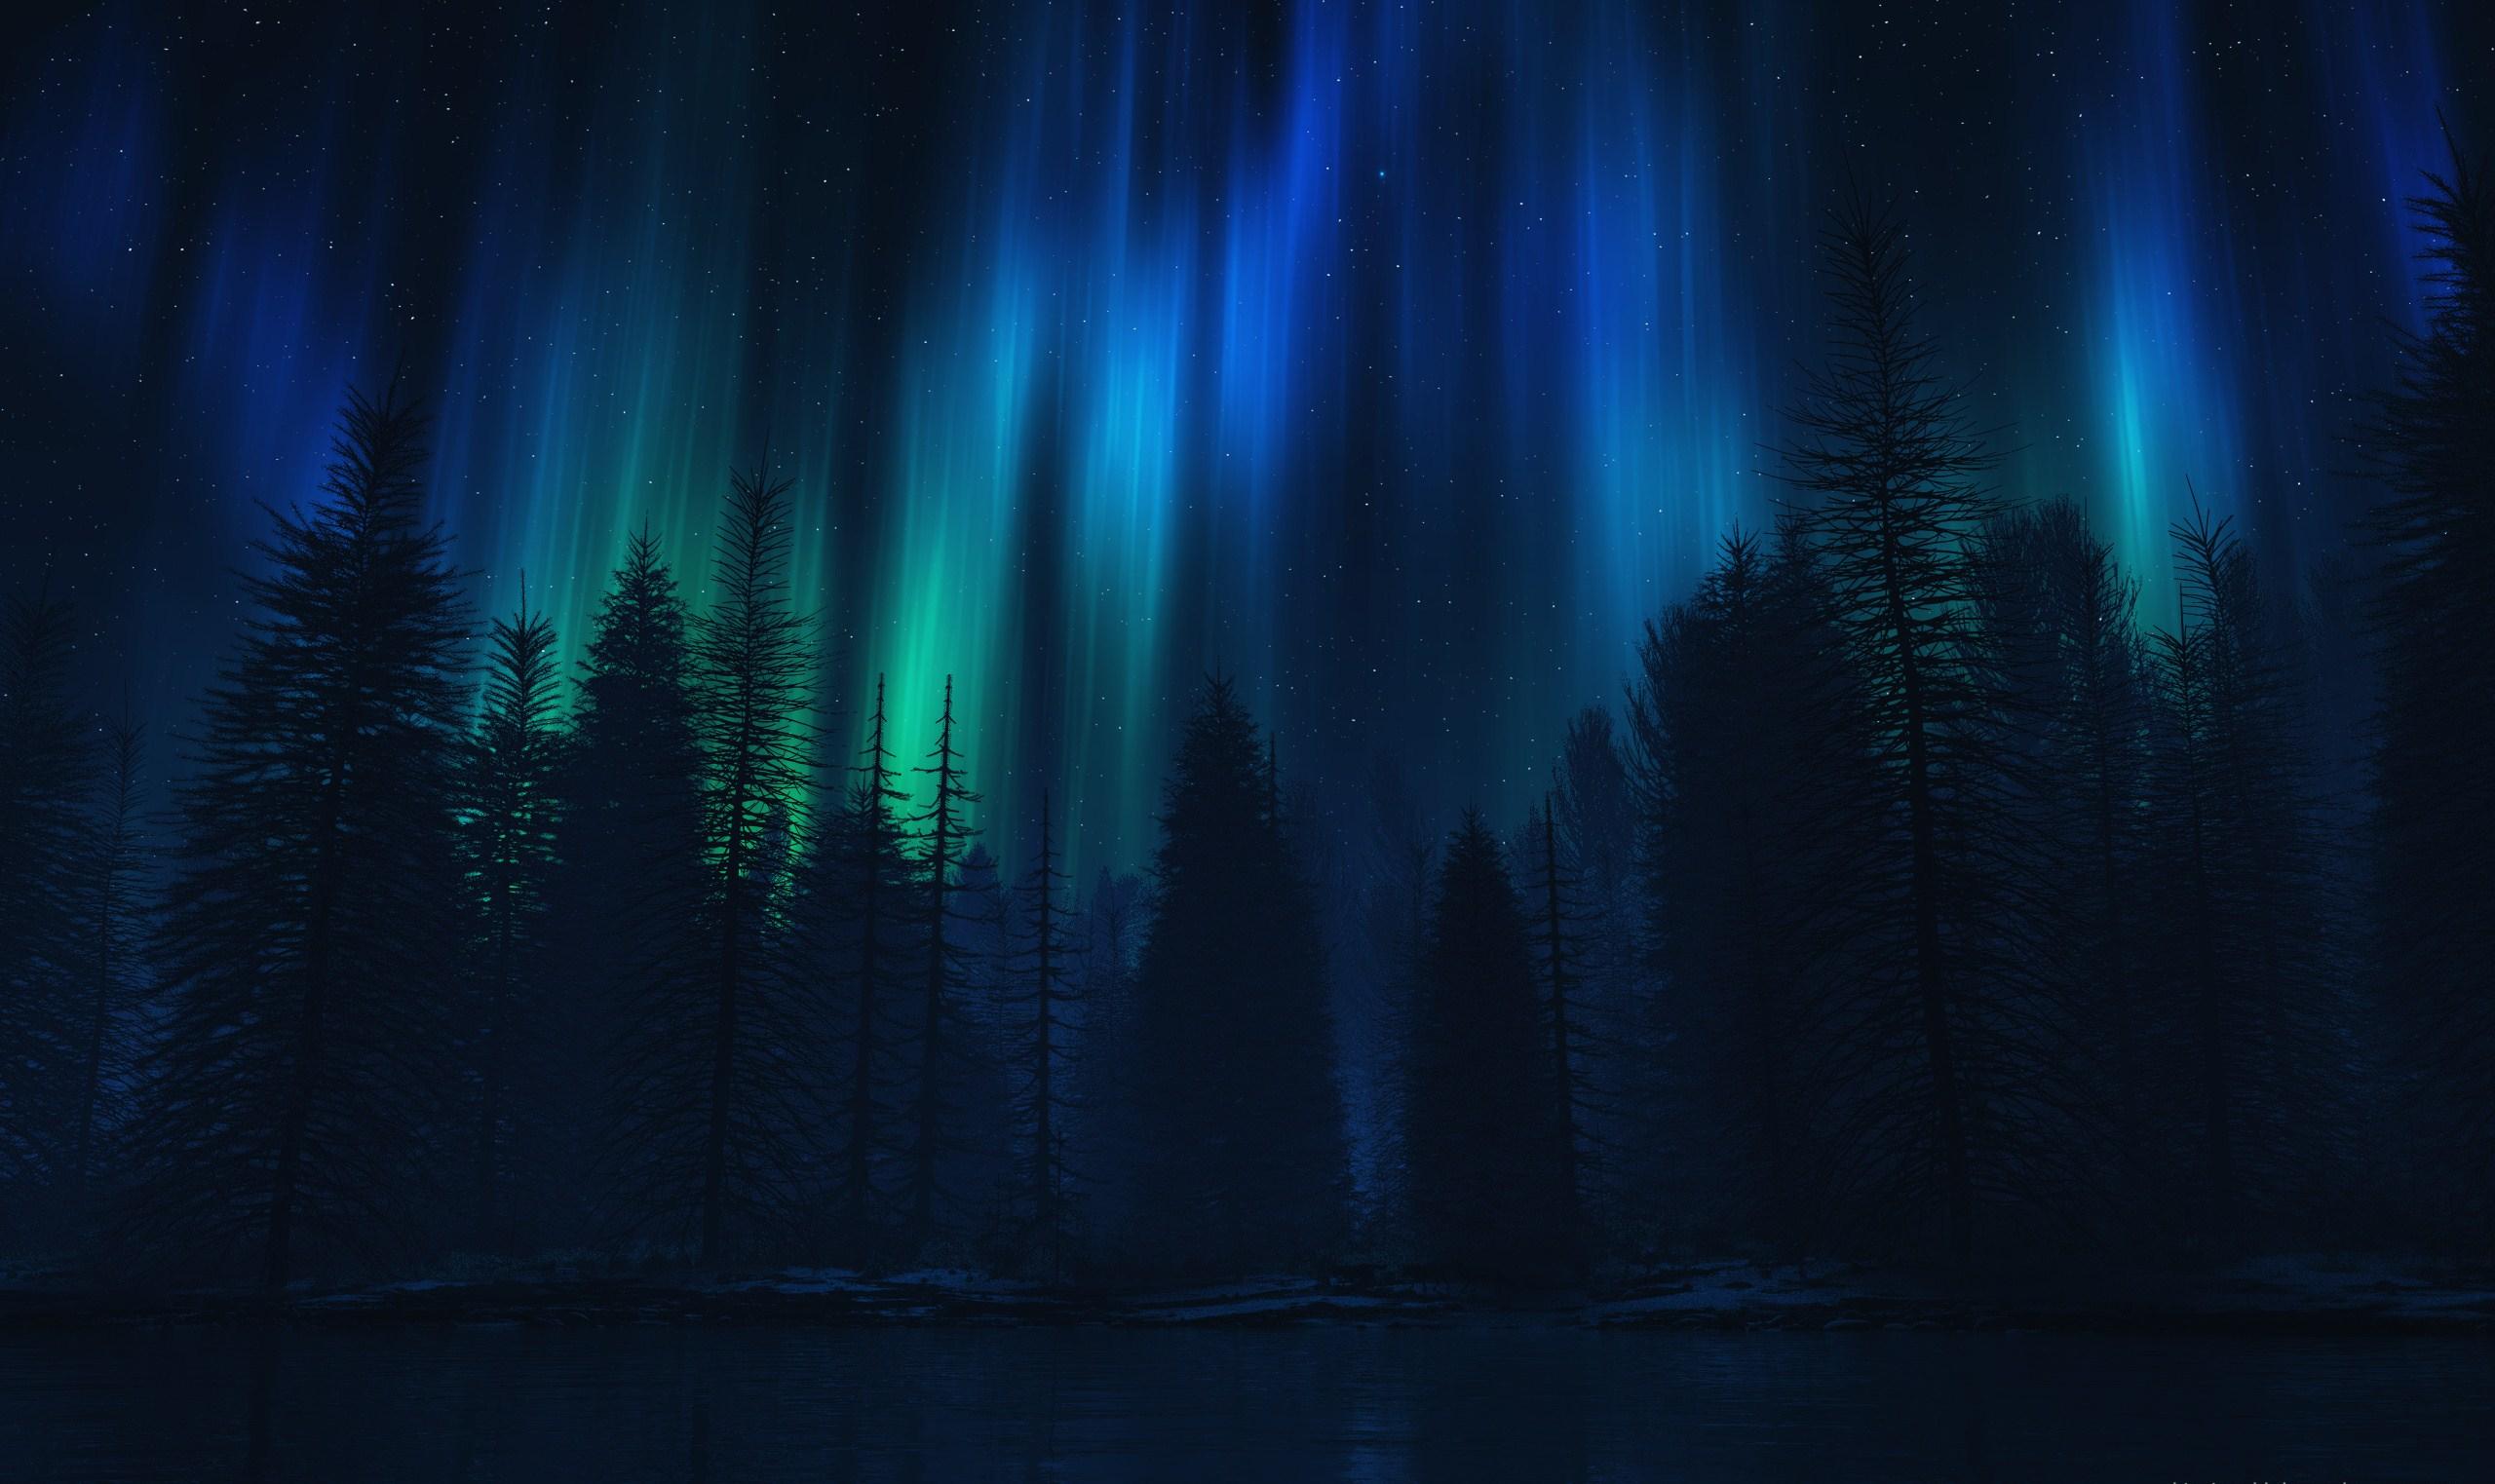 Aurora Borealis Wallpaper Hd - wallpaper